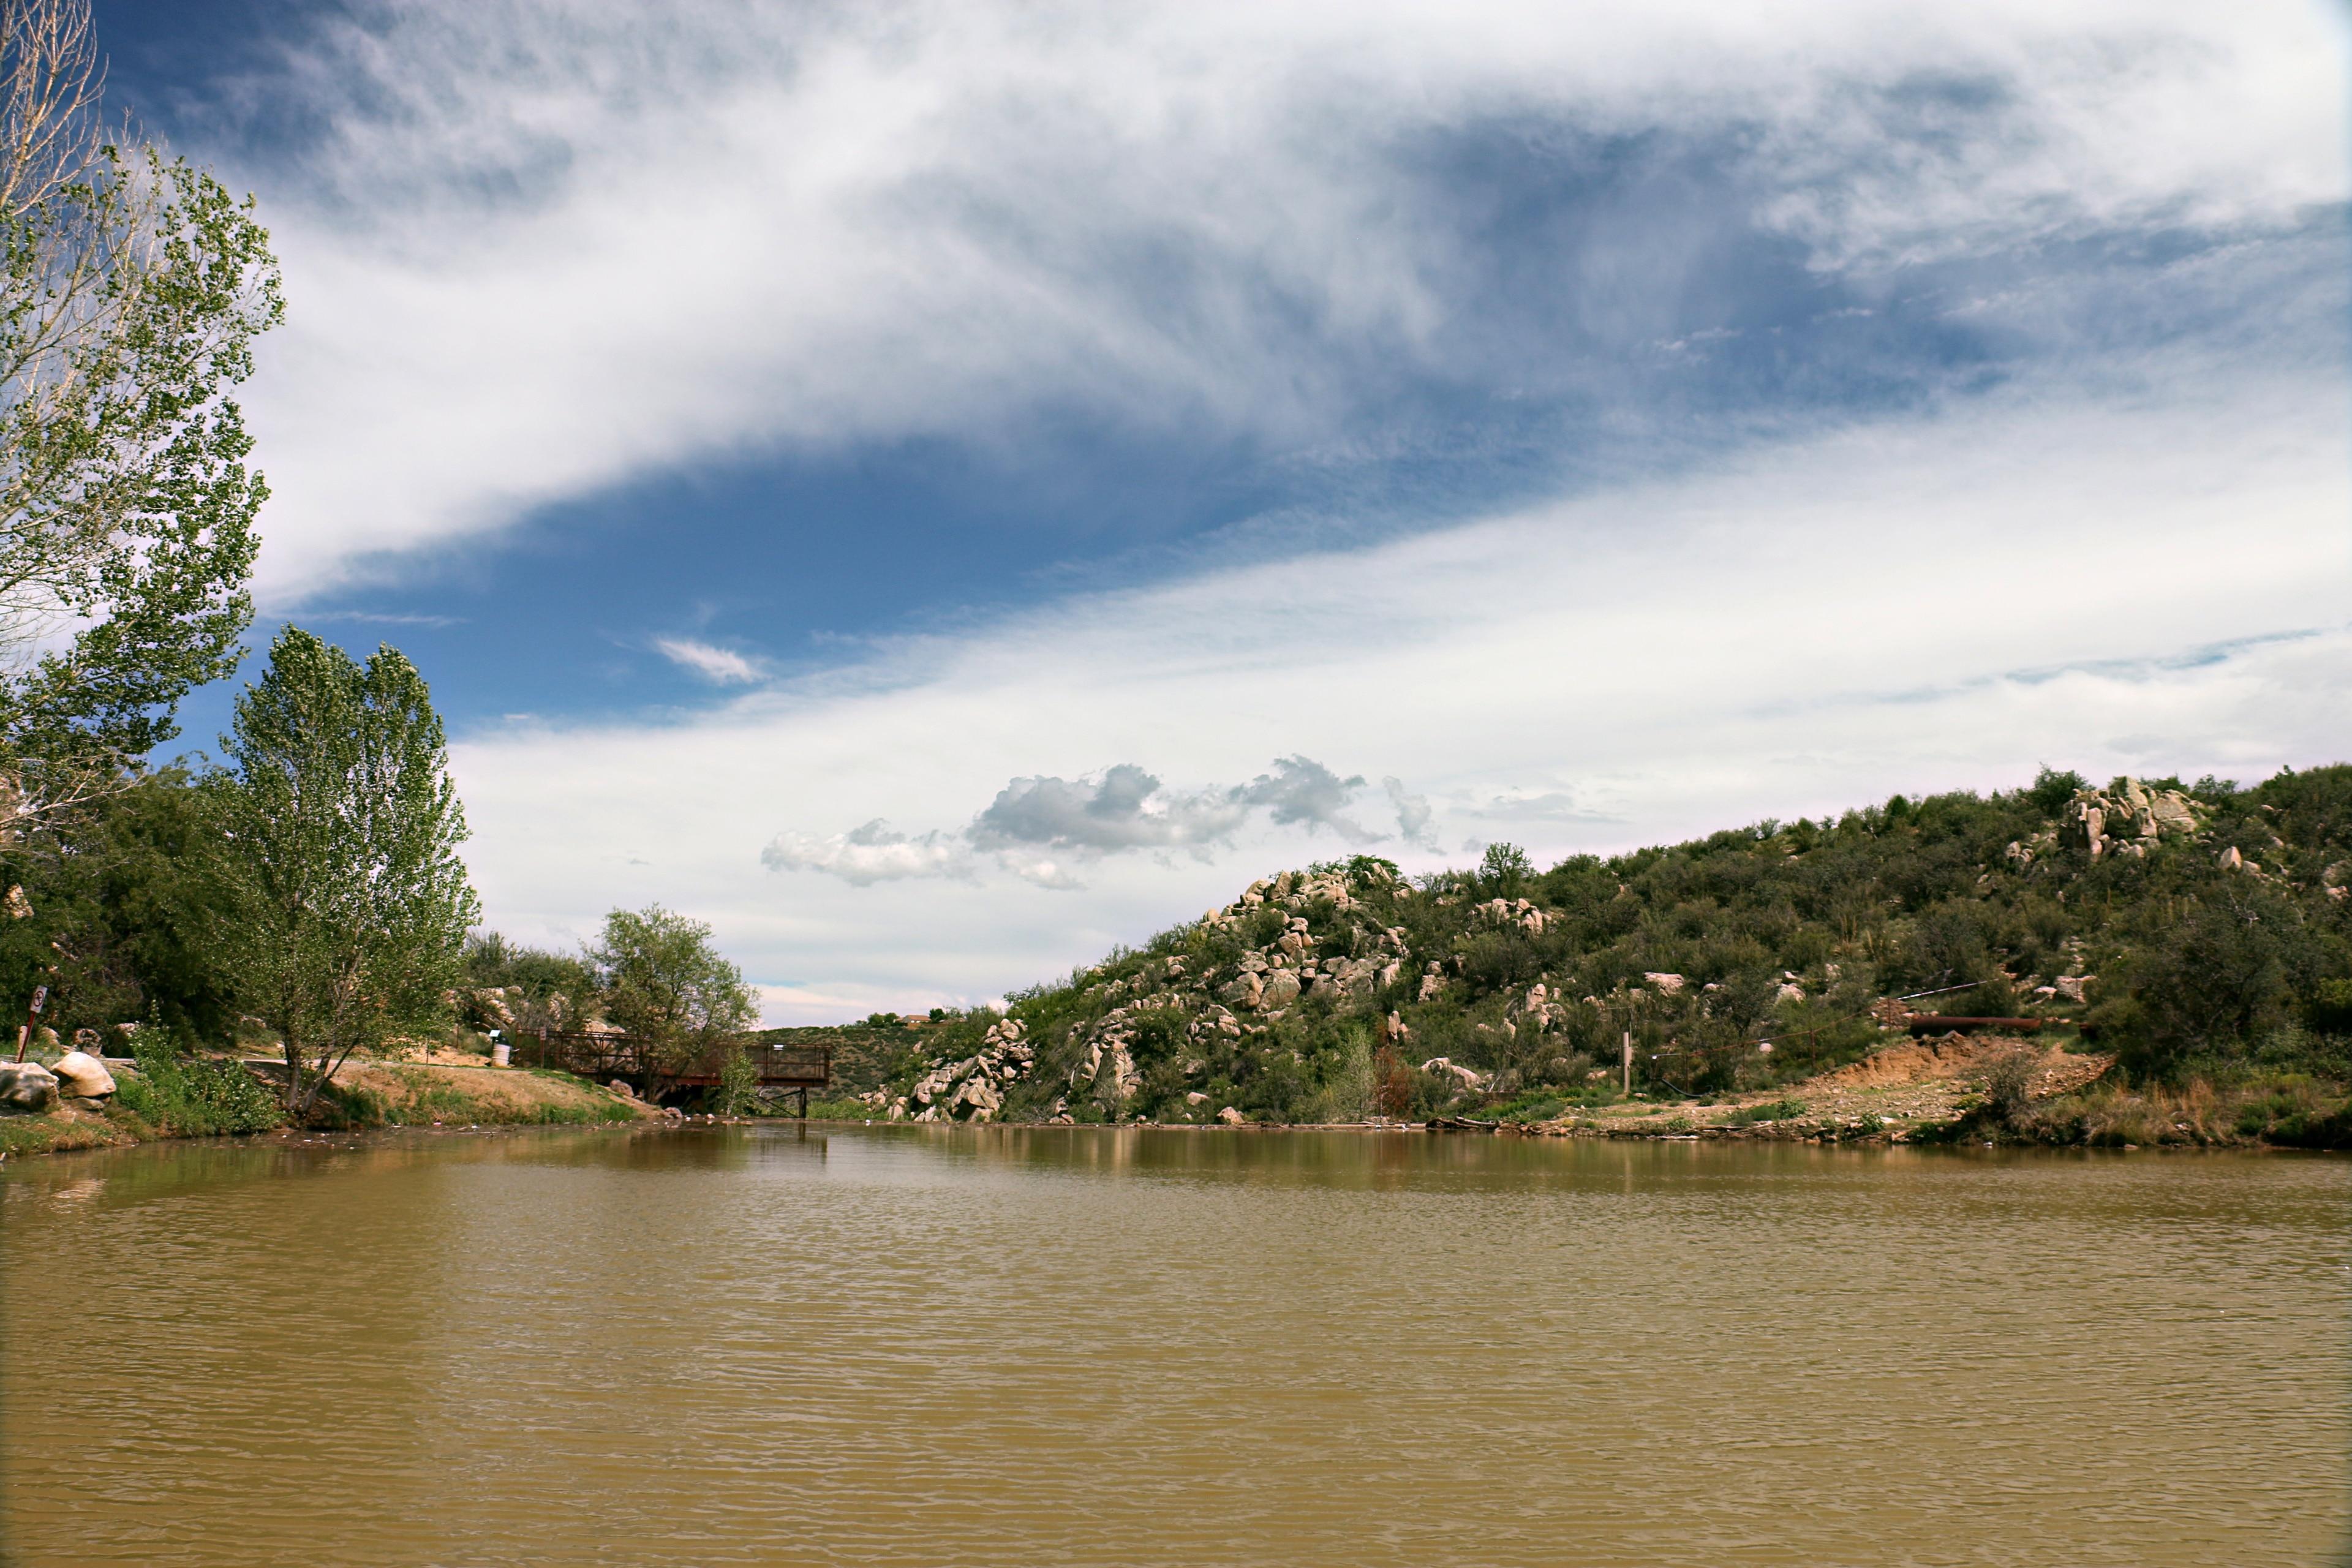 Prescott Valley, Arizona, United States of America